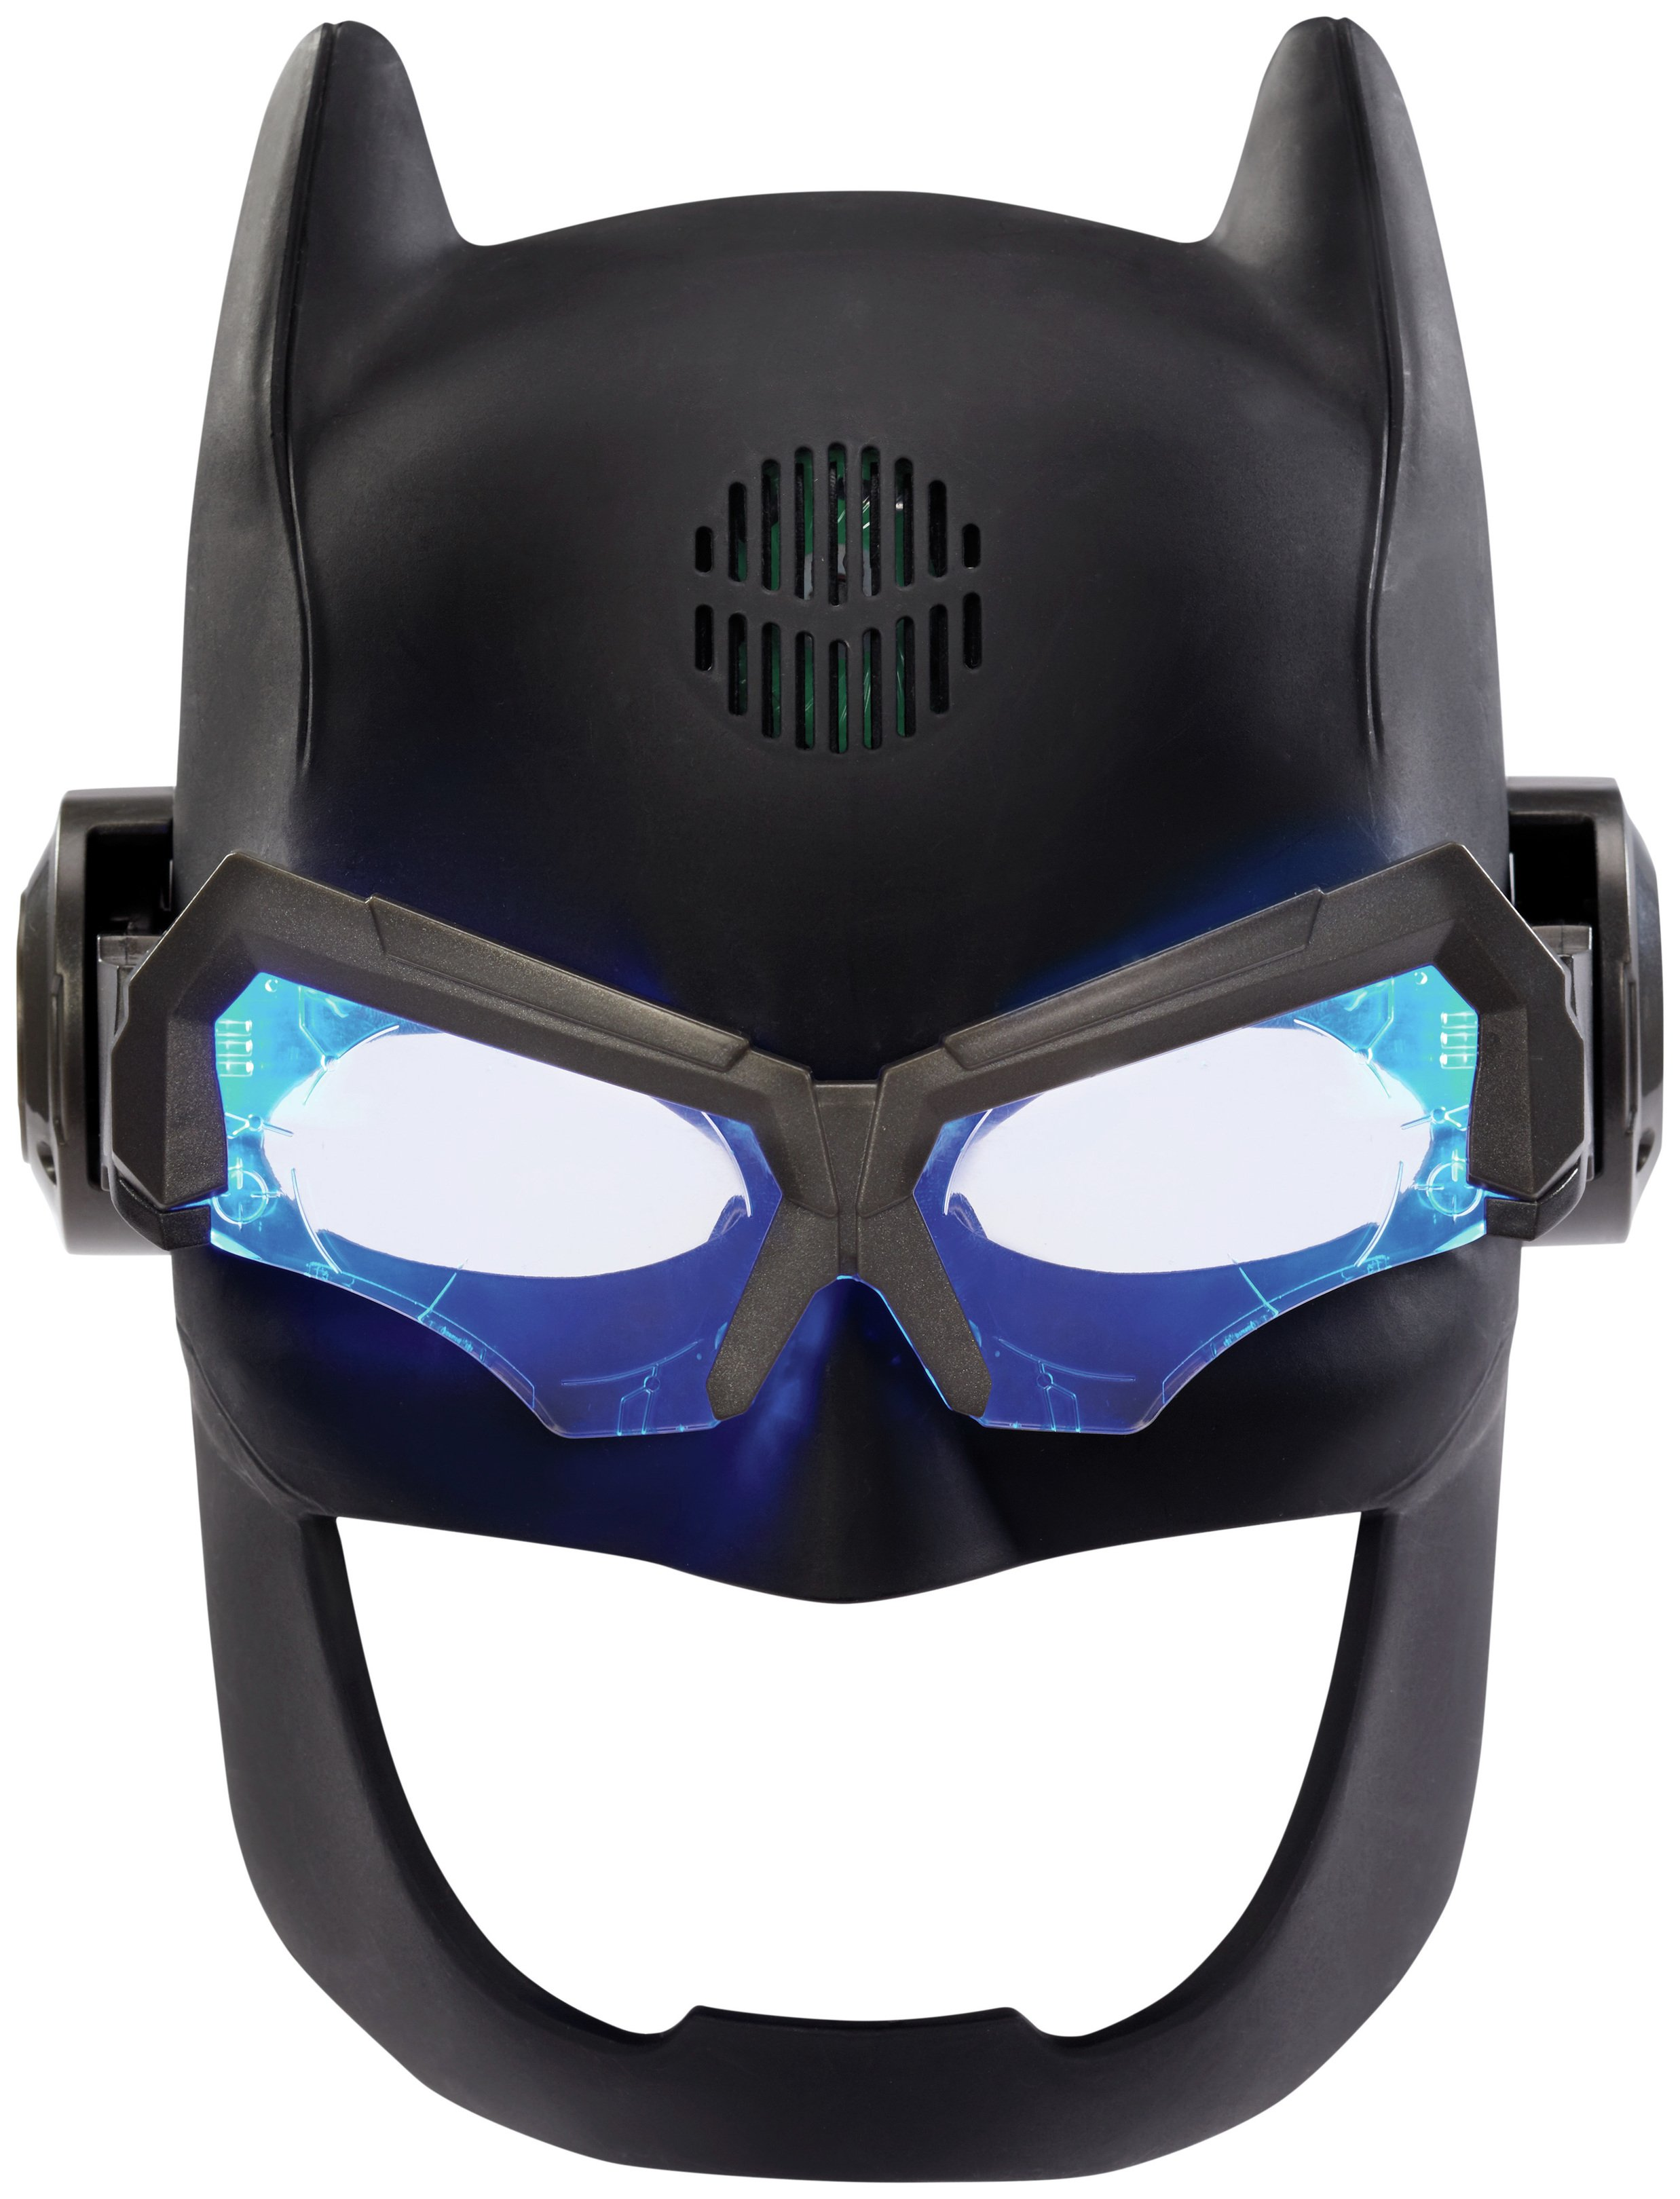 Image of Justice League Batman Voice Changing Tactical Helmet